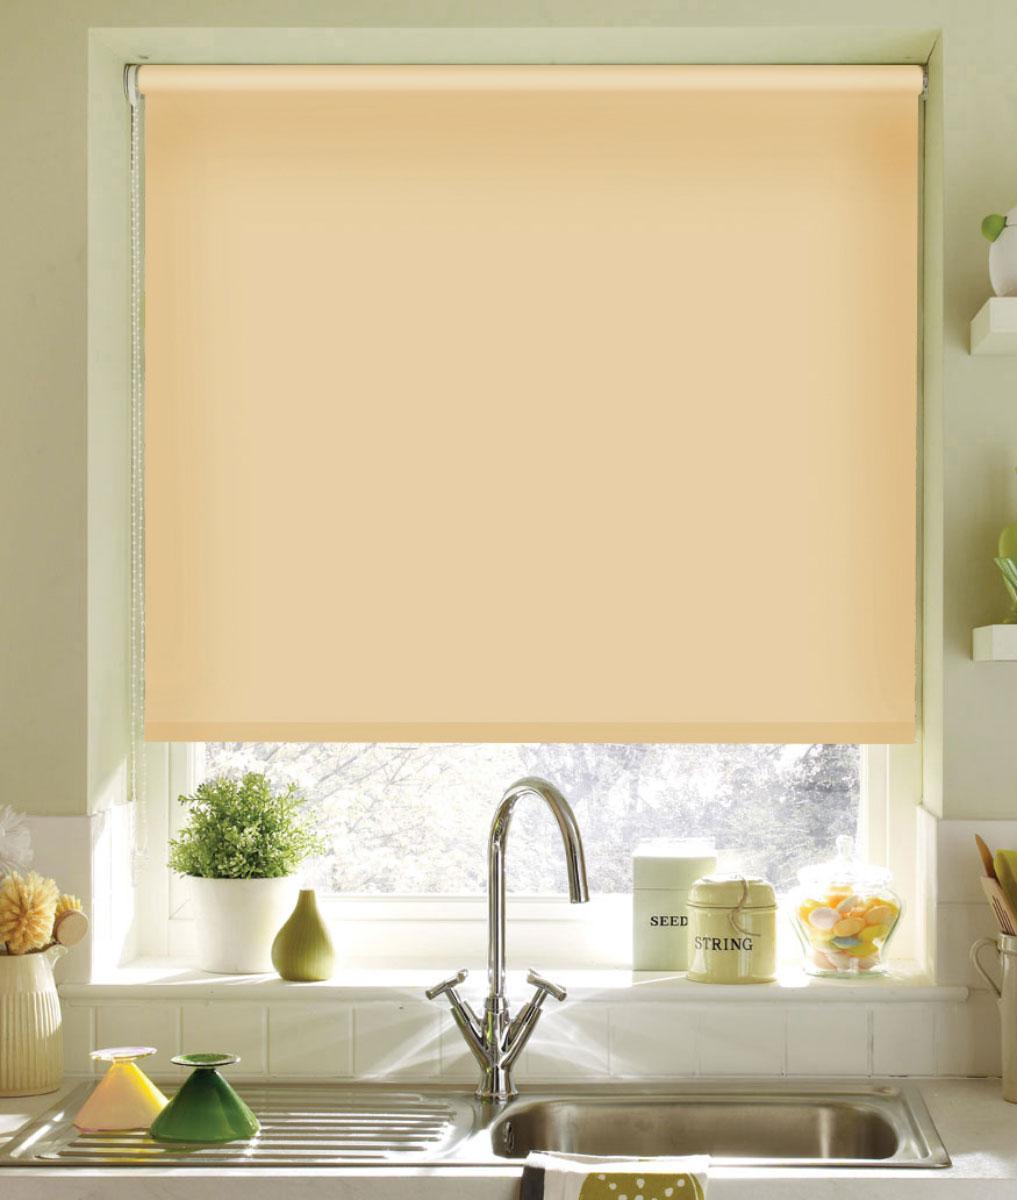 Миниролло KauffOrt 37х170 см, цвет: светлый абрикос